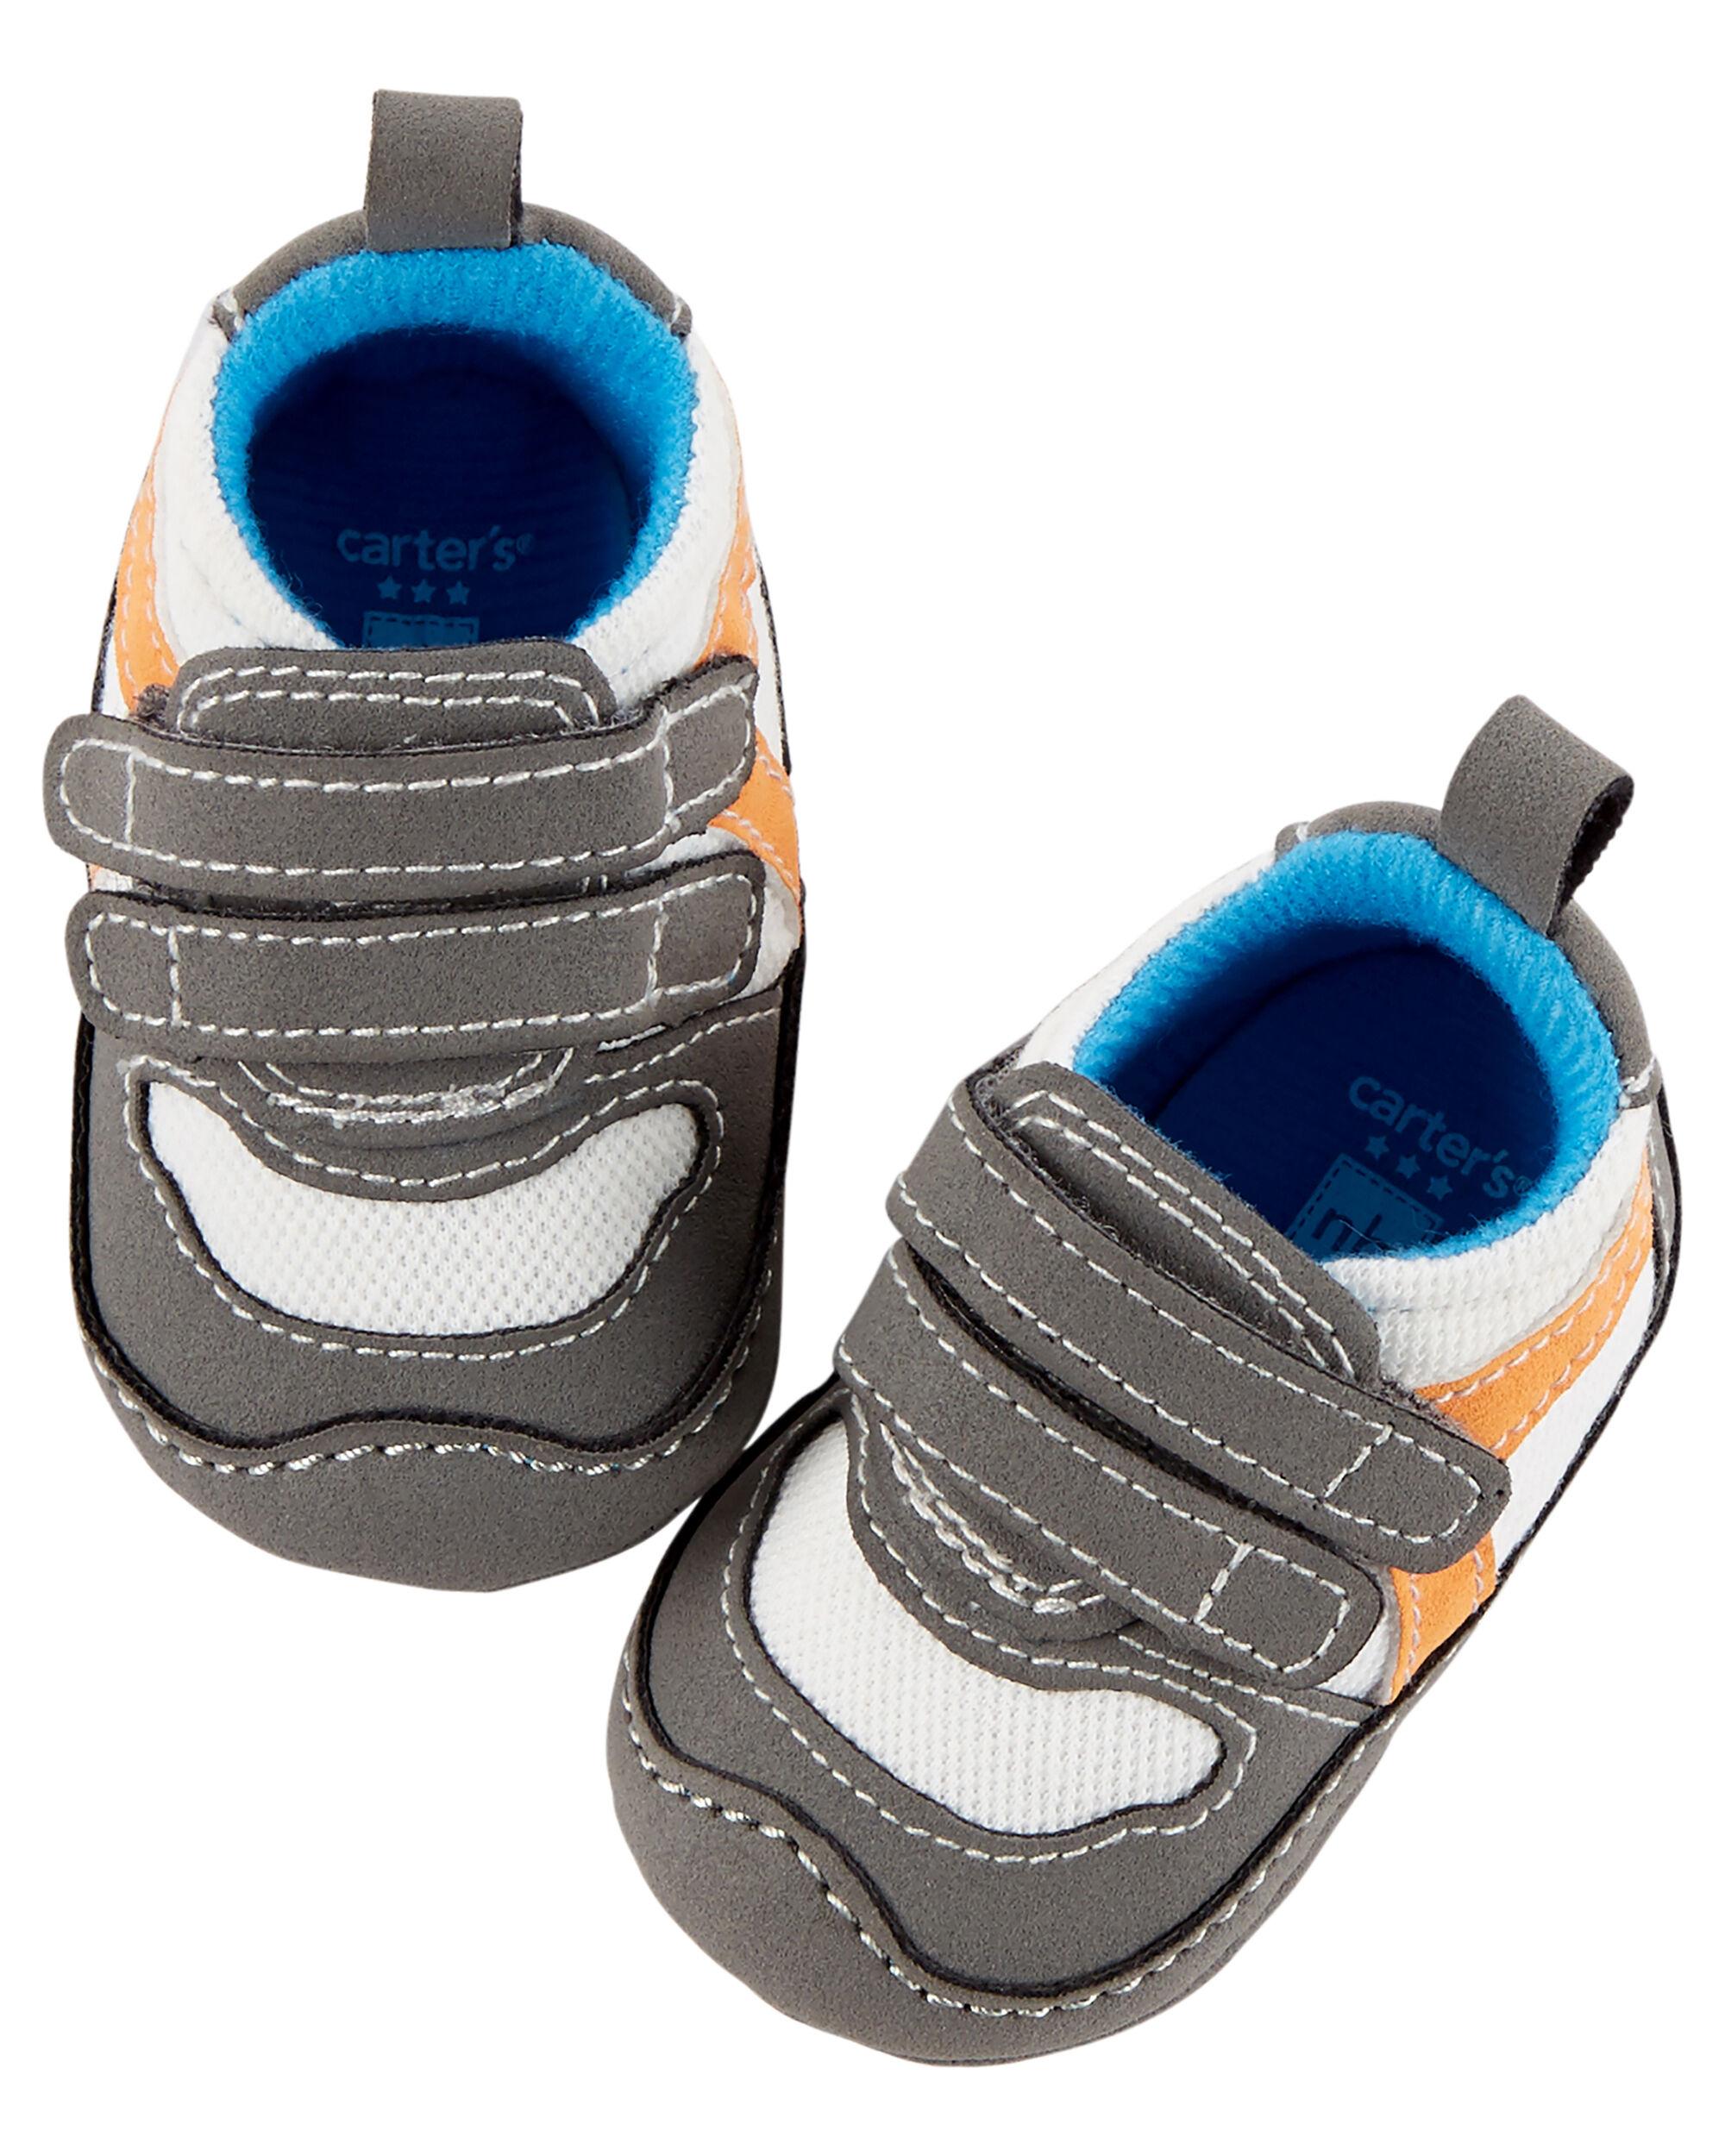 Carter s Joby Rocker Crib Shoes